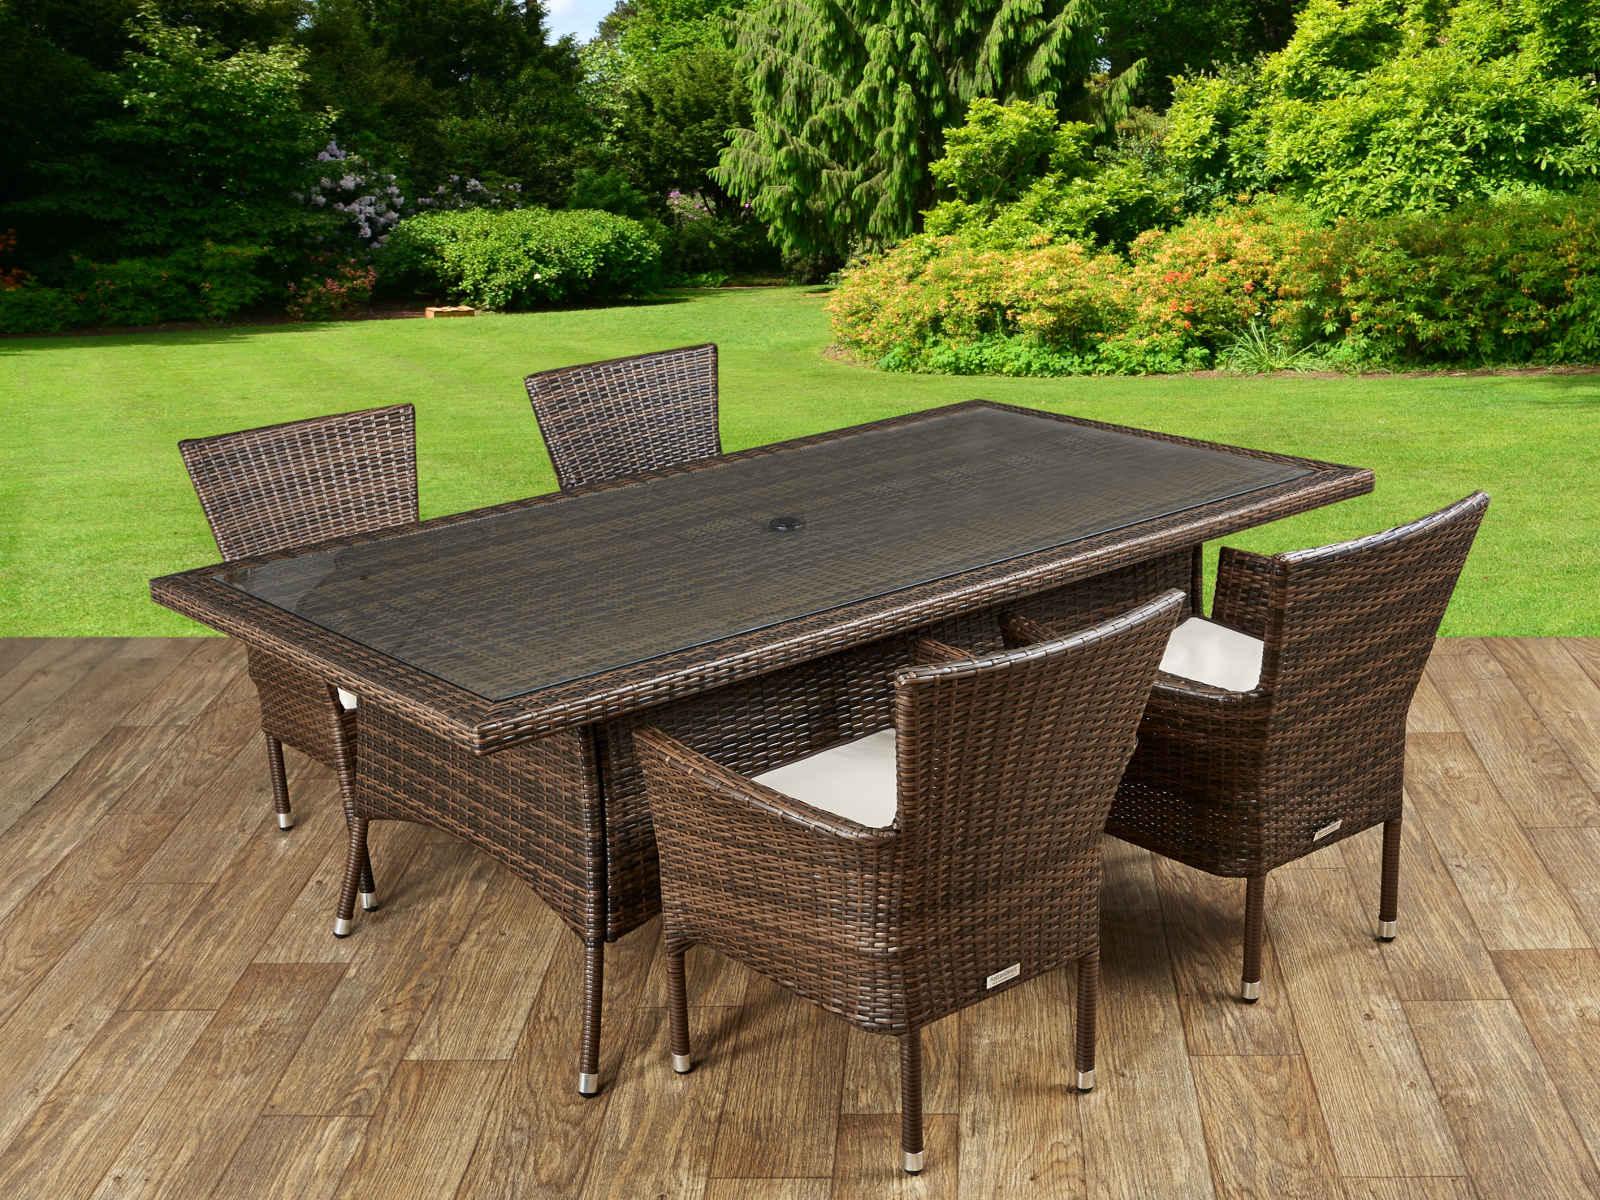 Cambridge 4 Rattan Garden Chairs and Rectangular Table Set in